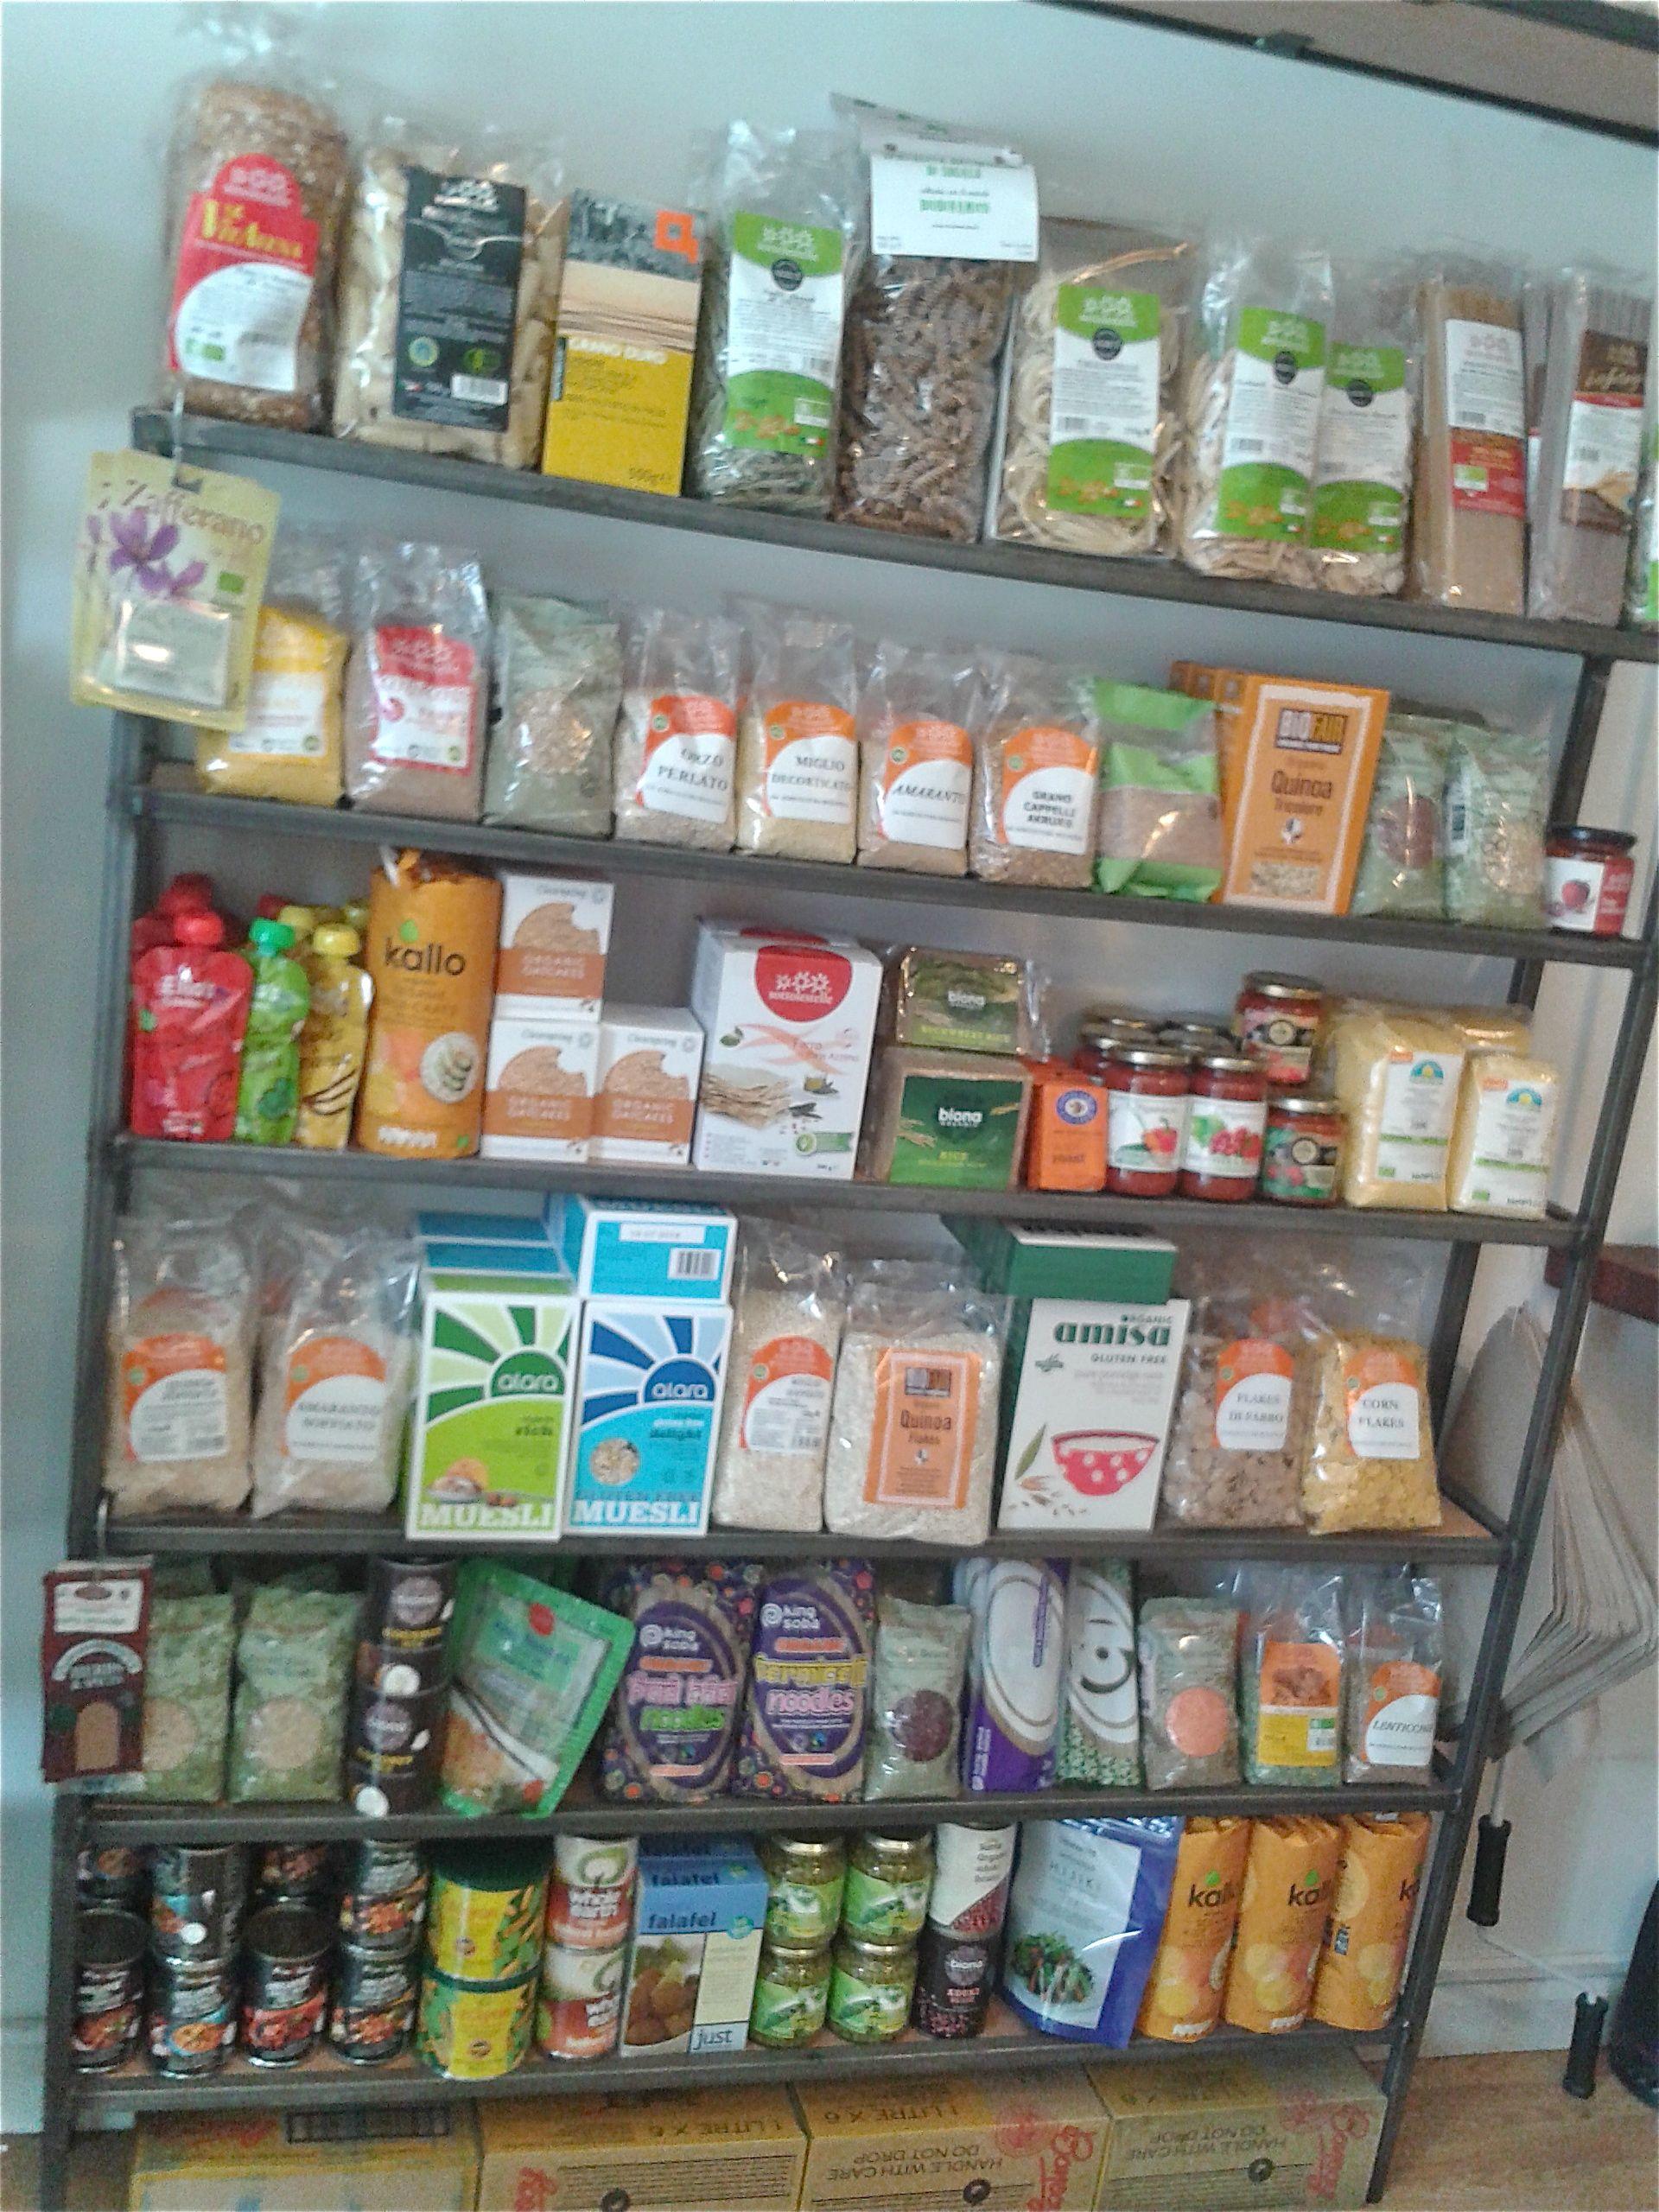 https://i2.wp.com/fatgayvegan.com/wp-content/uploads/2013/09/groceries.jpg?fit=1920%2C2560